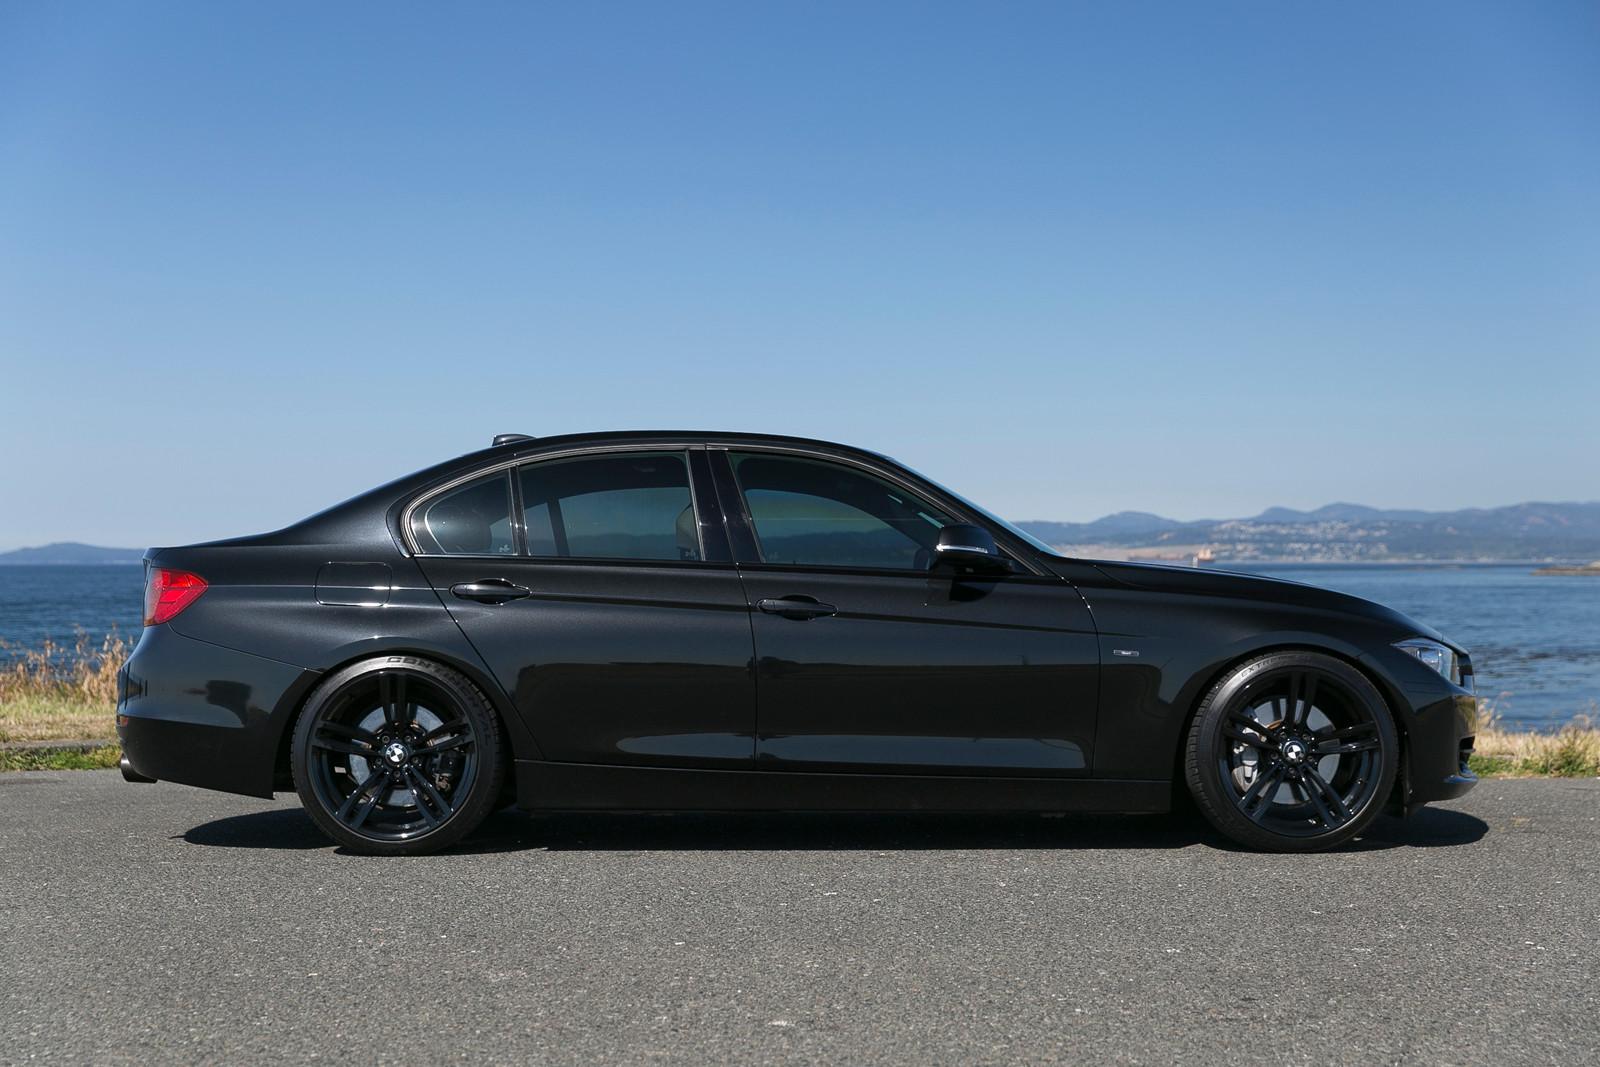 2012 bmw 335i 6 speed sedan silver arrow cars ltd. Black Bedroom Furniture Sets. Home Design Ideas